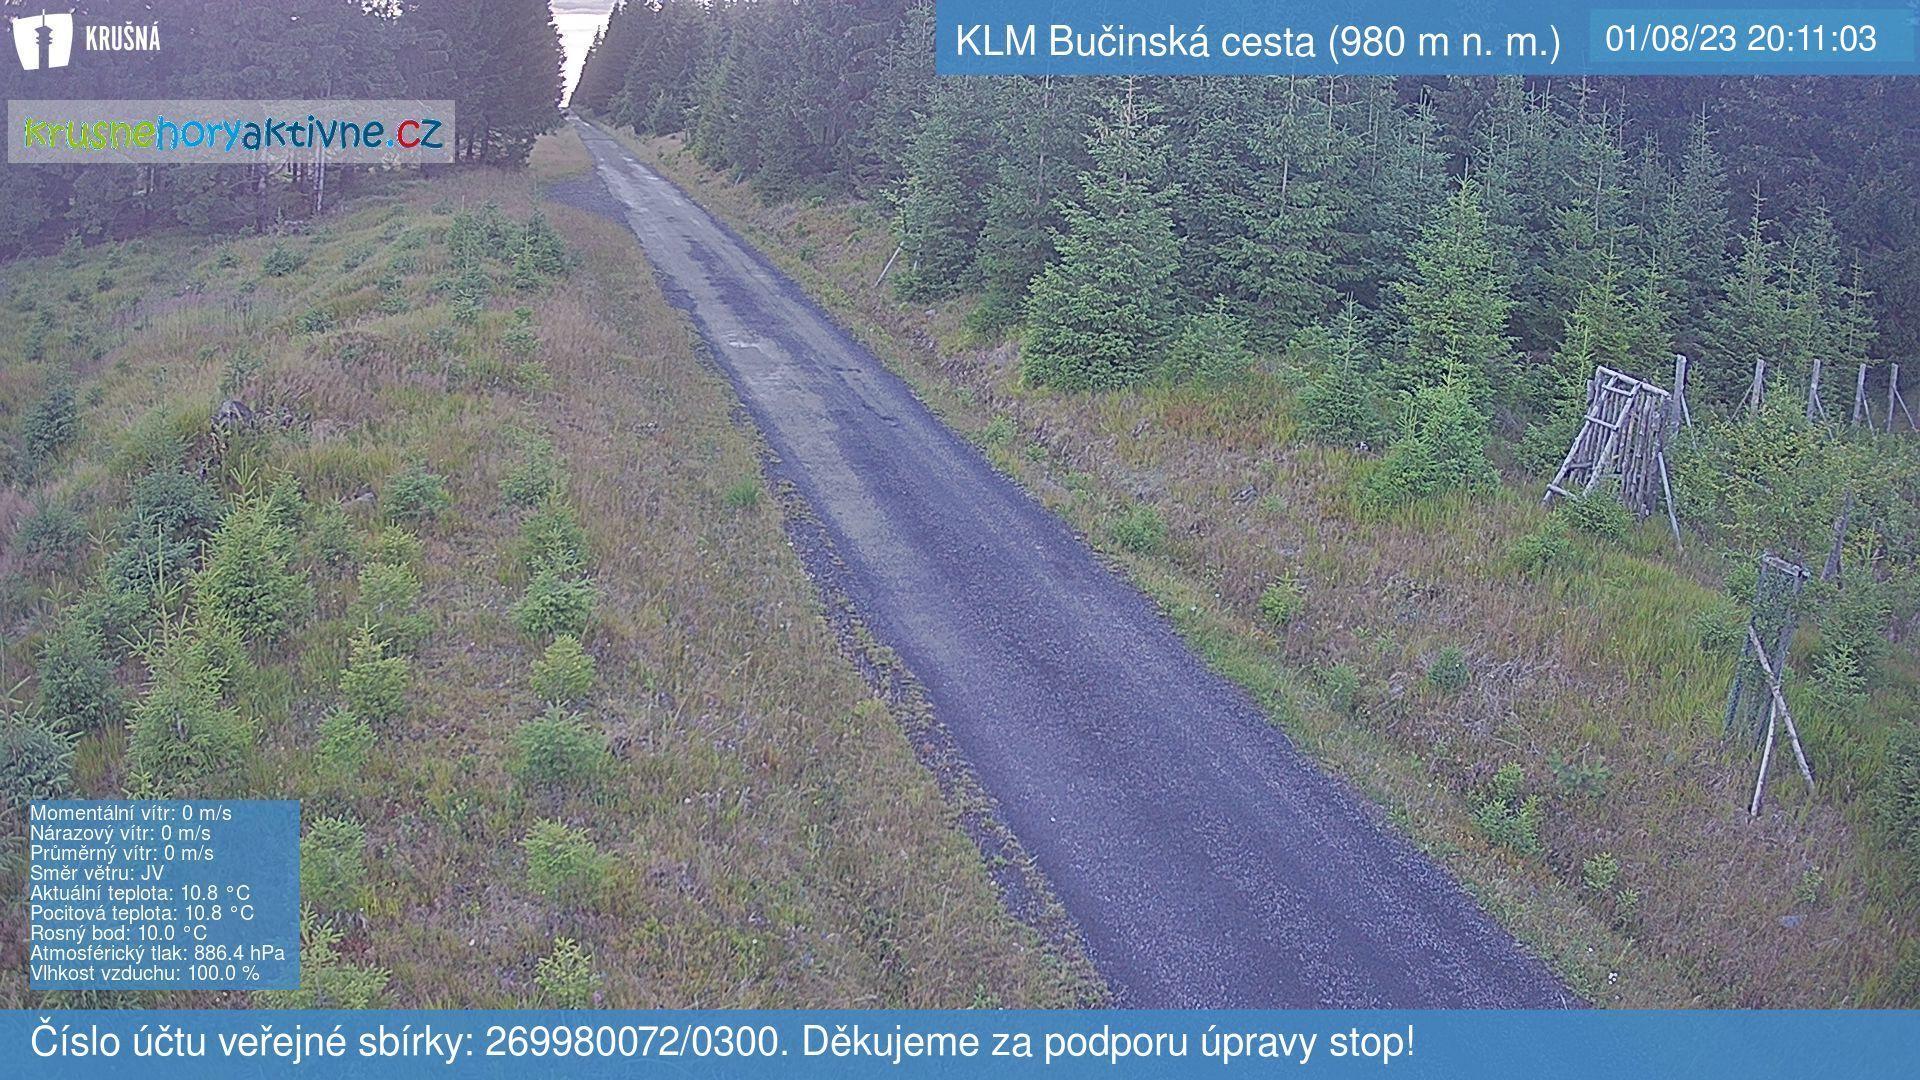 Webkamera KLM Bučinská cesta (980 m n. m.)